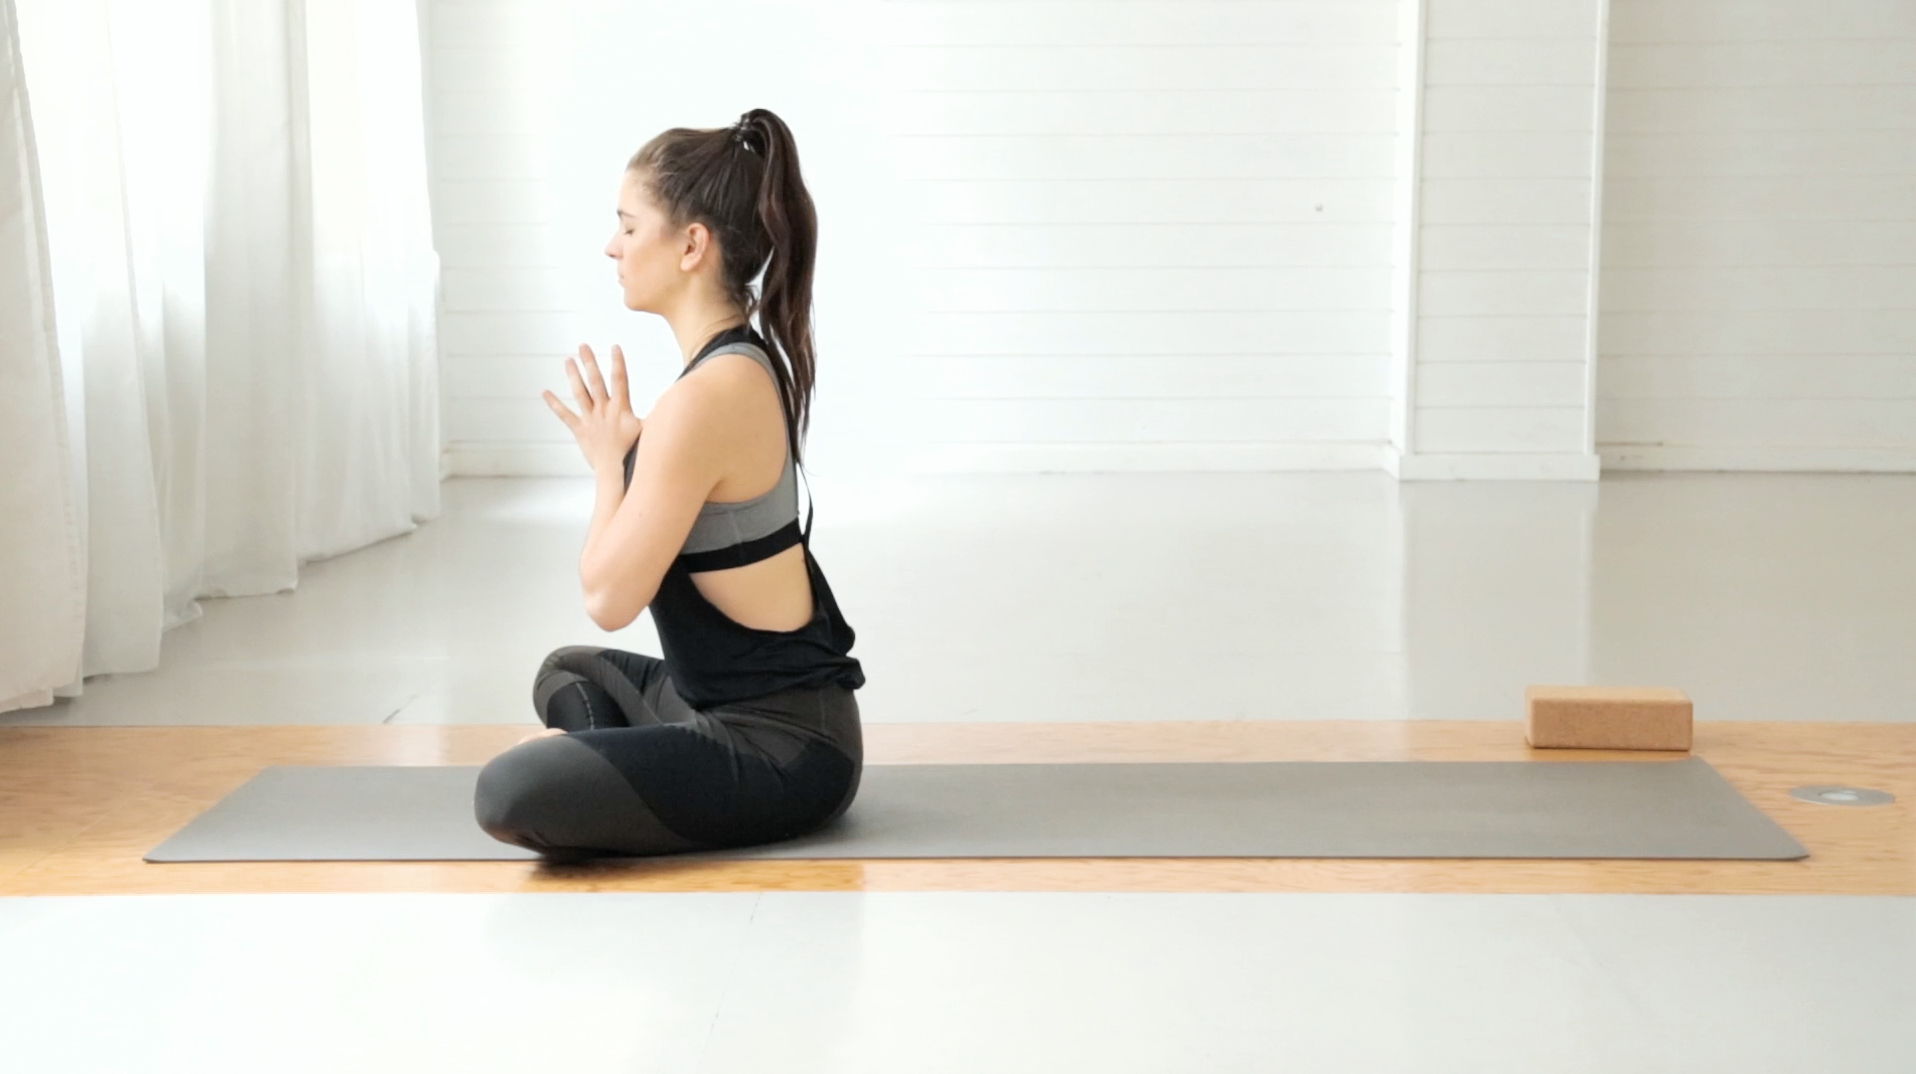 beine-po-booty-yoga-mady-morrison-15